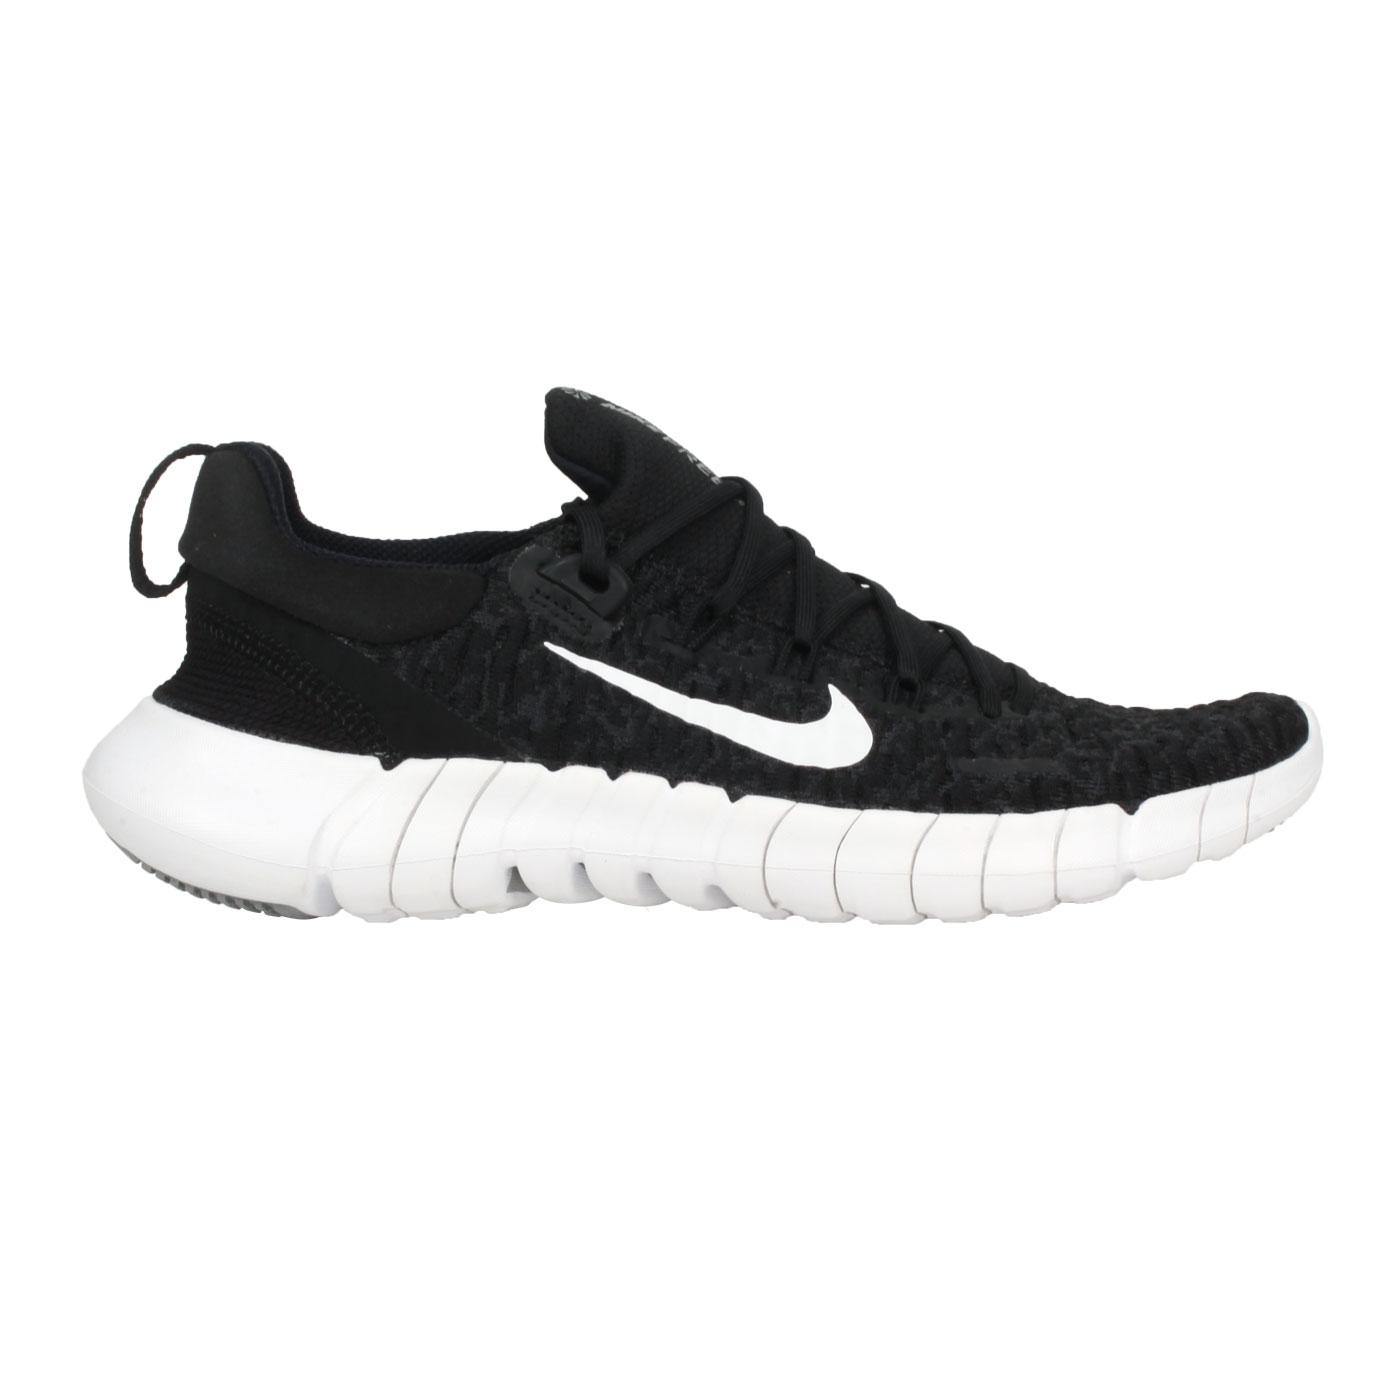 NIKE 女款運動慢跑鞋  @W FREE RN 5.0 NEXT NATURE@CZ1891001 - 黑白